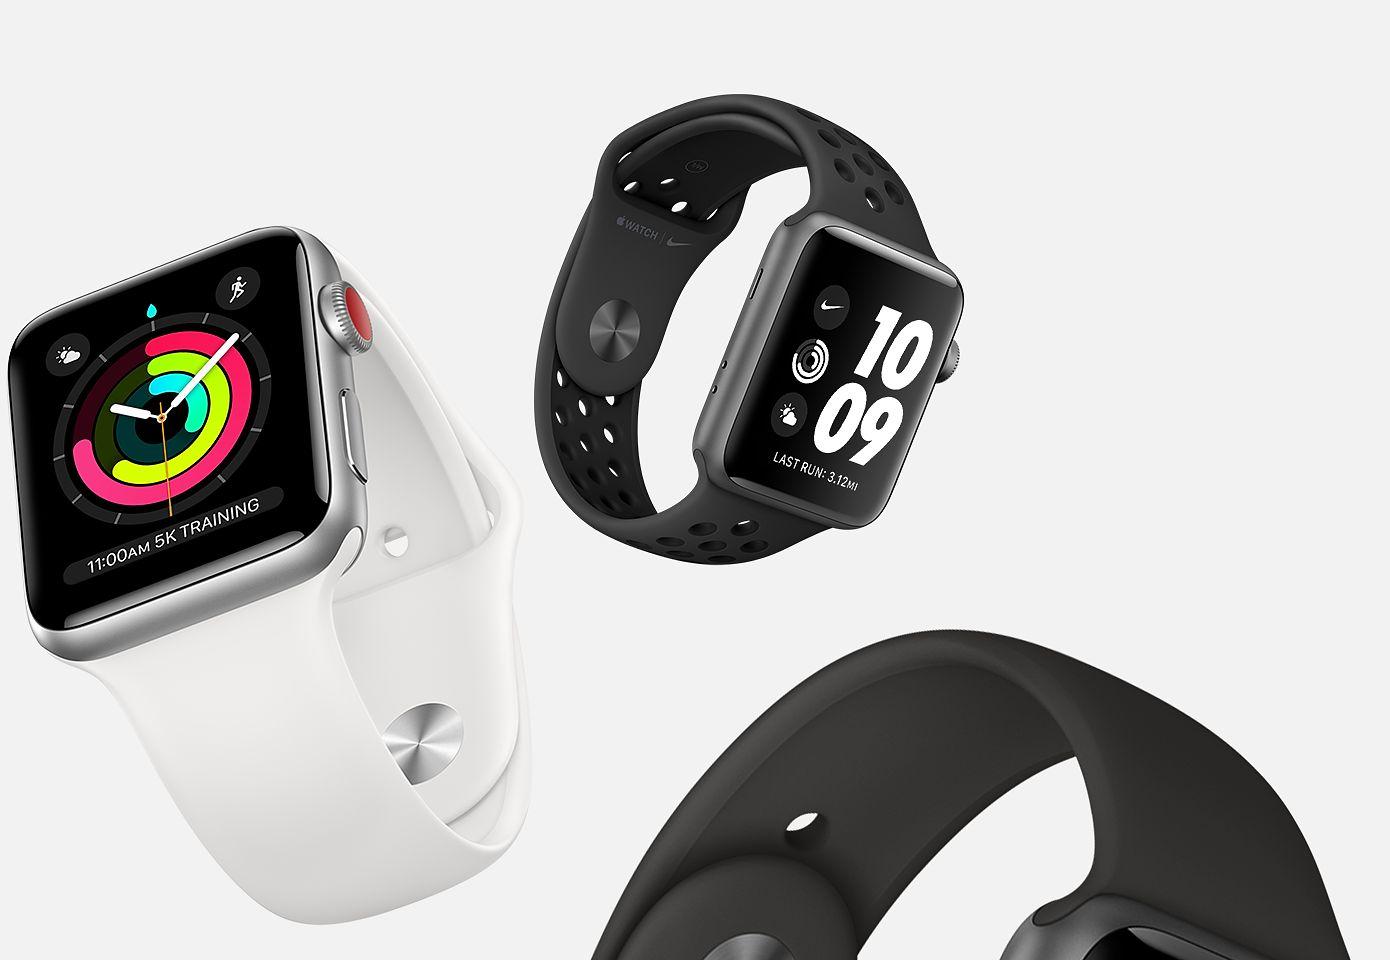 [Apple.com] Apple Watch Series 3 im Abverkauf - ab 229 Euro